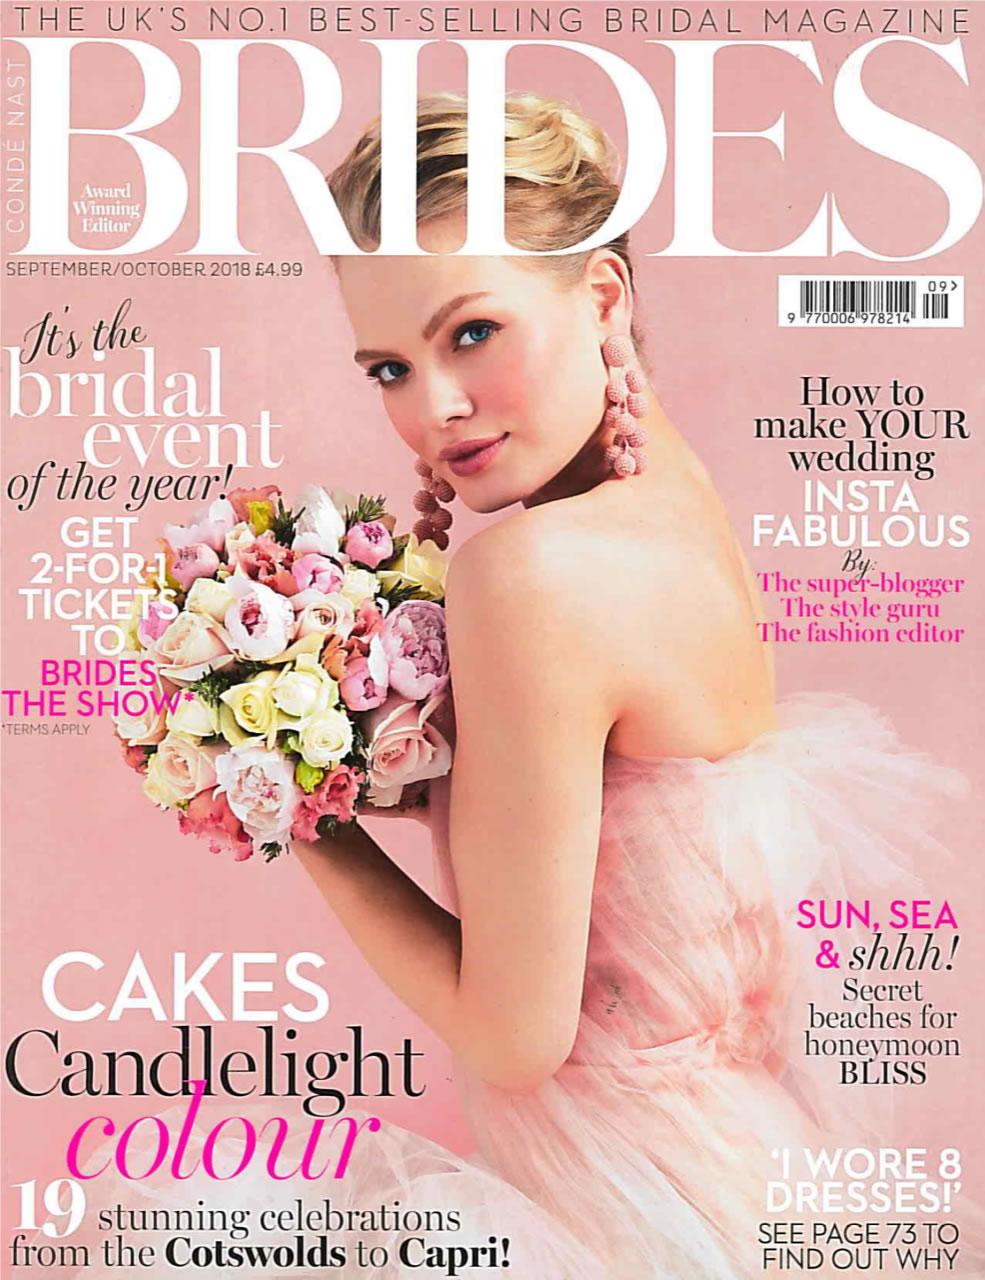 BRIDES MAGAZINE SEPT/OCTOBER 2018 -